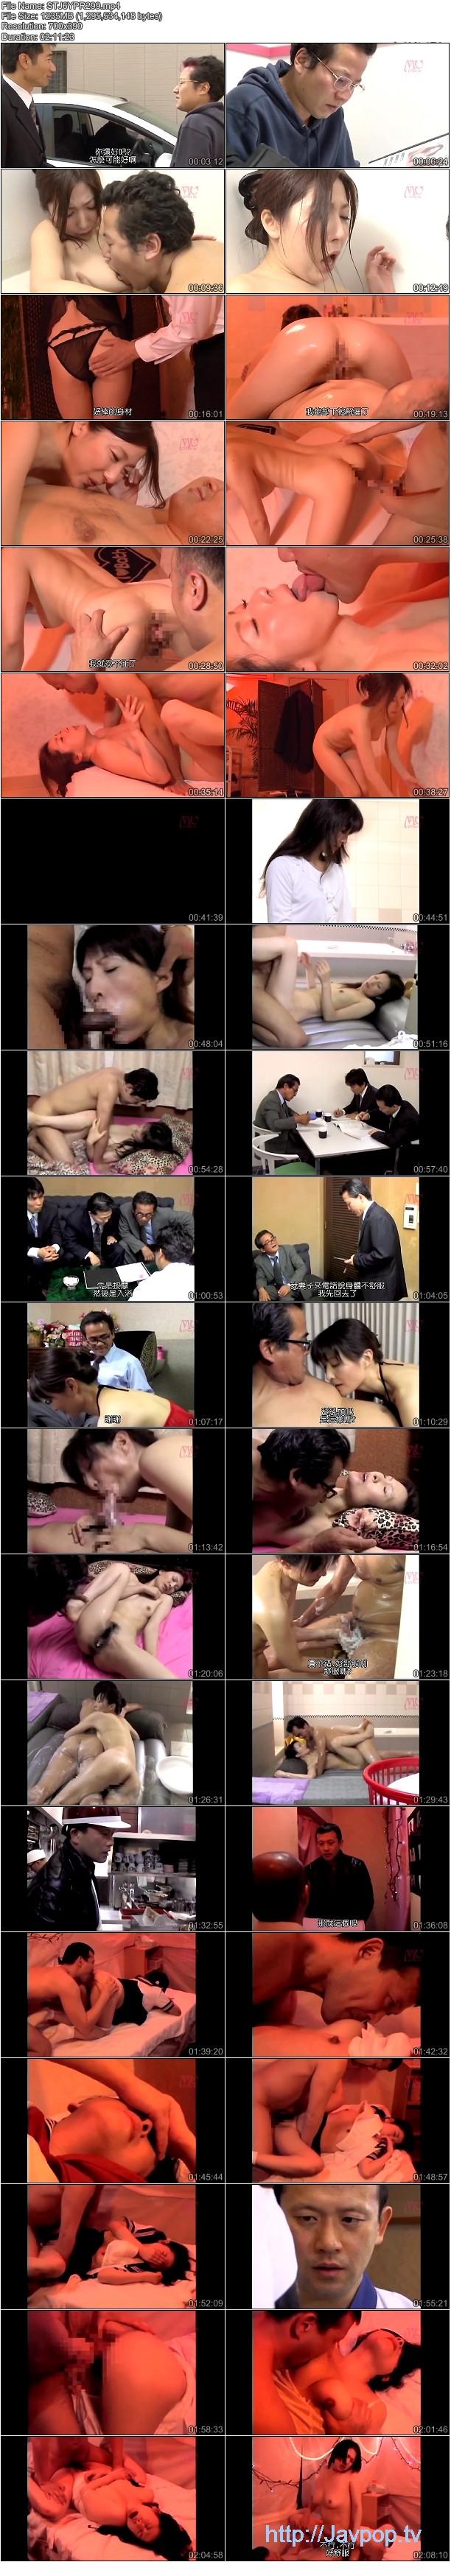 [NSPS-299] 為了錢,為了老公的性癖好。。讓老婆被其它男人上。 總集篇[中文字幕]